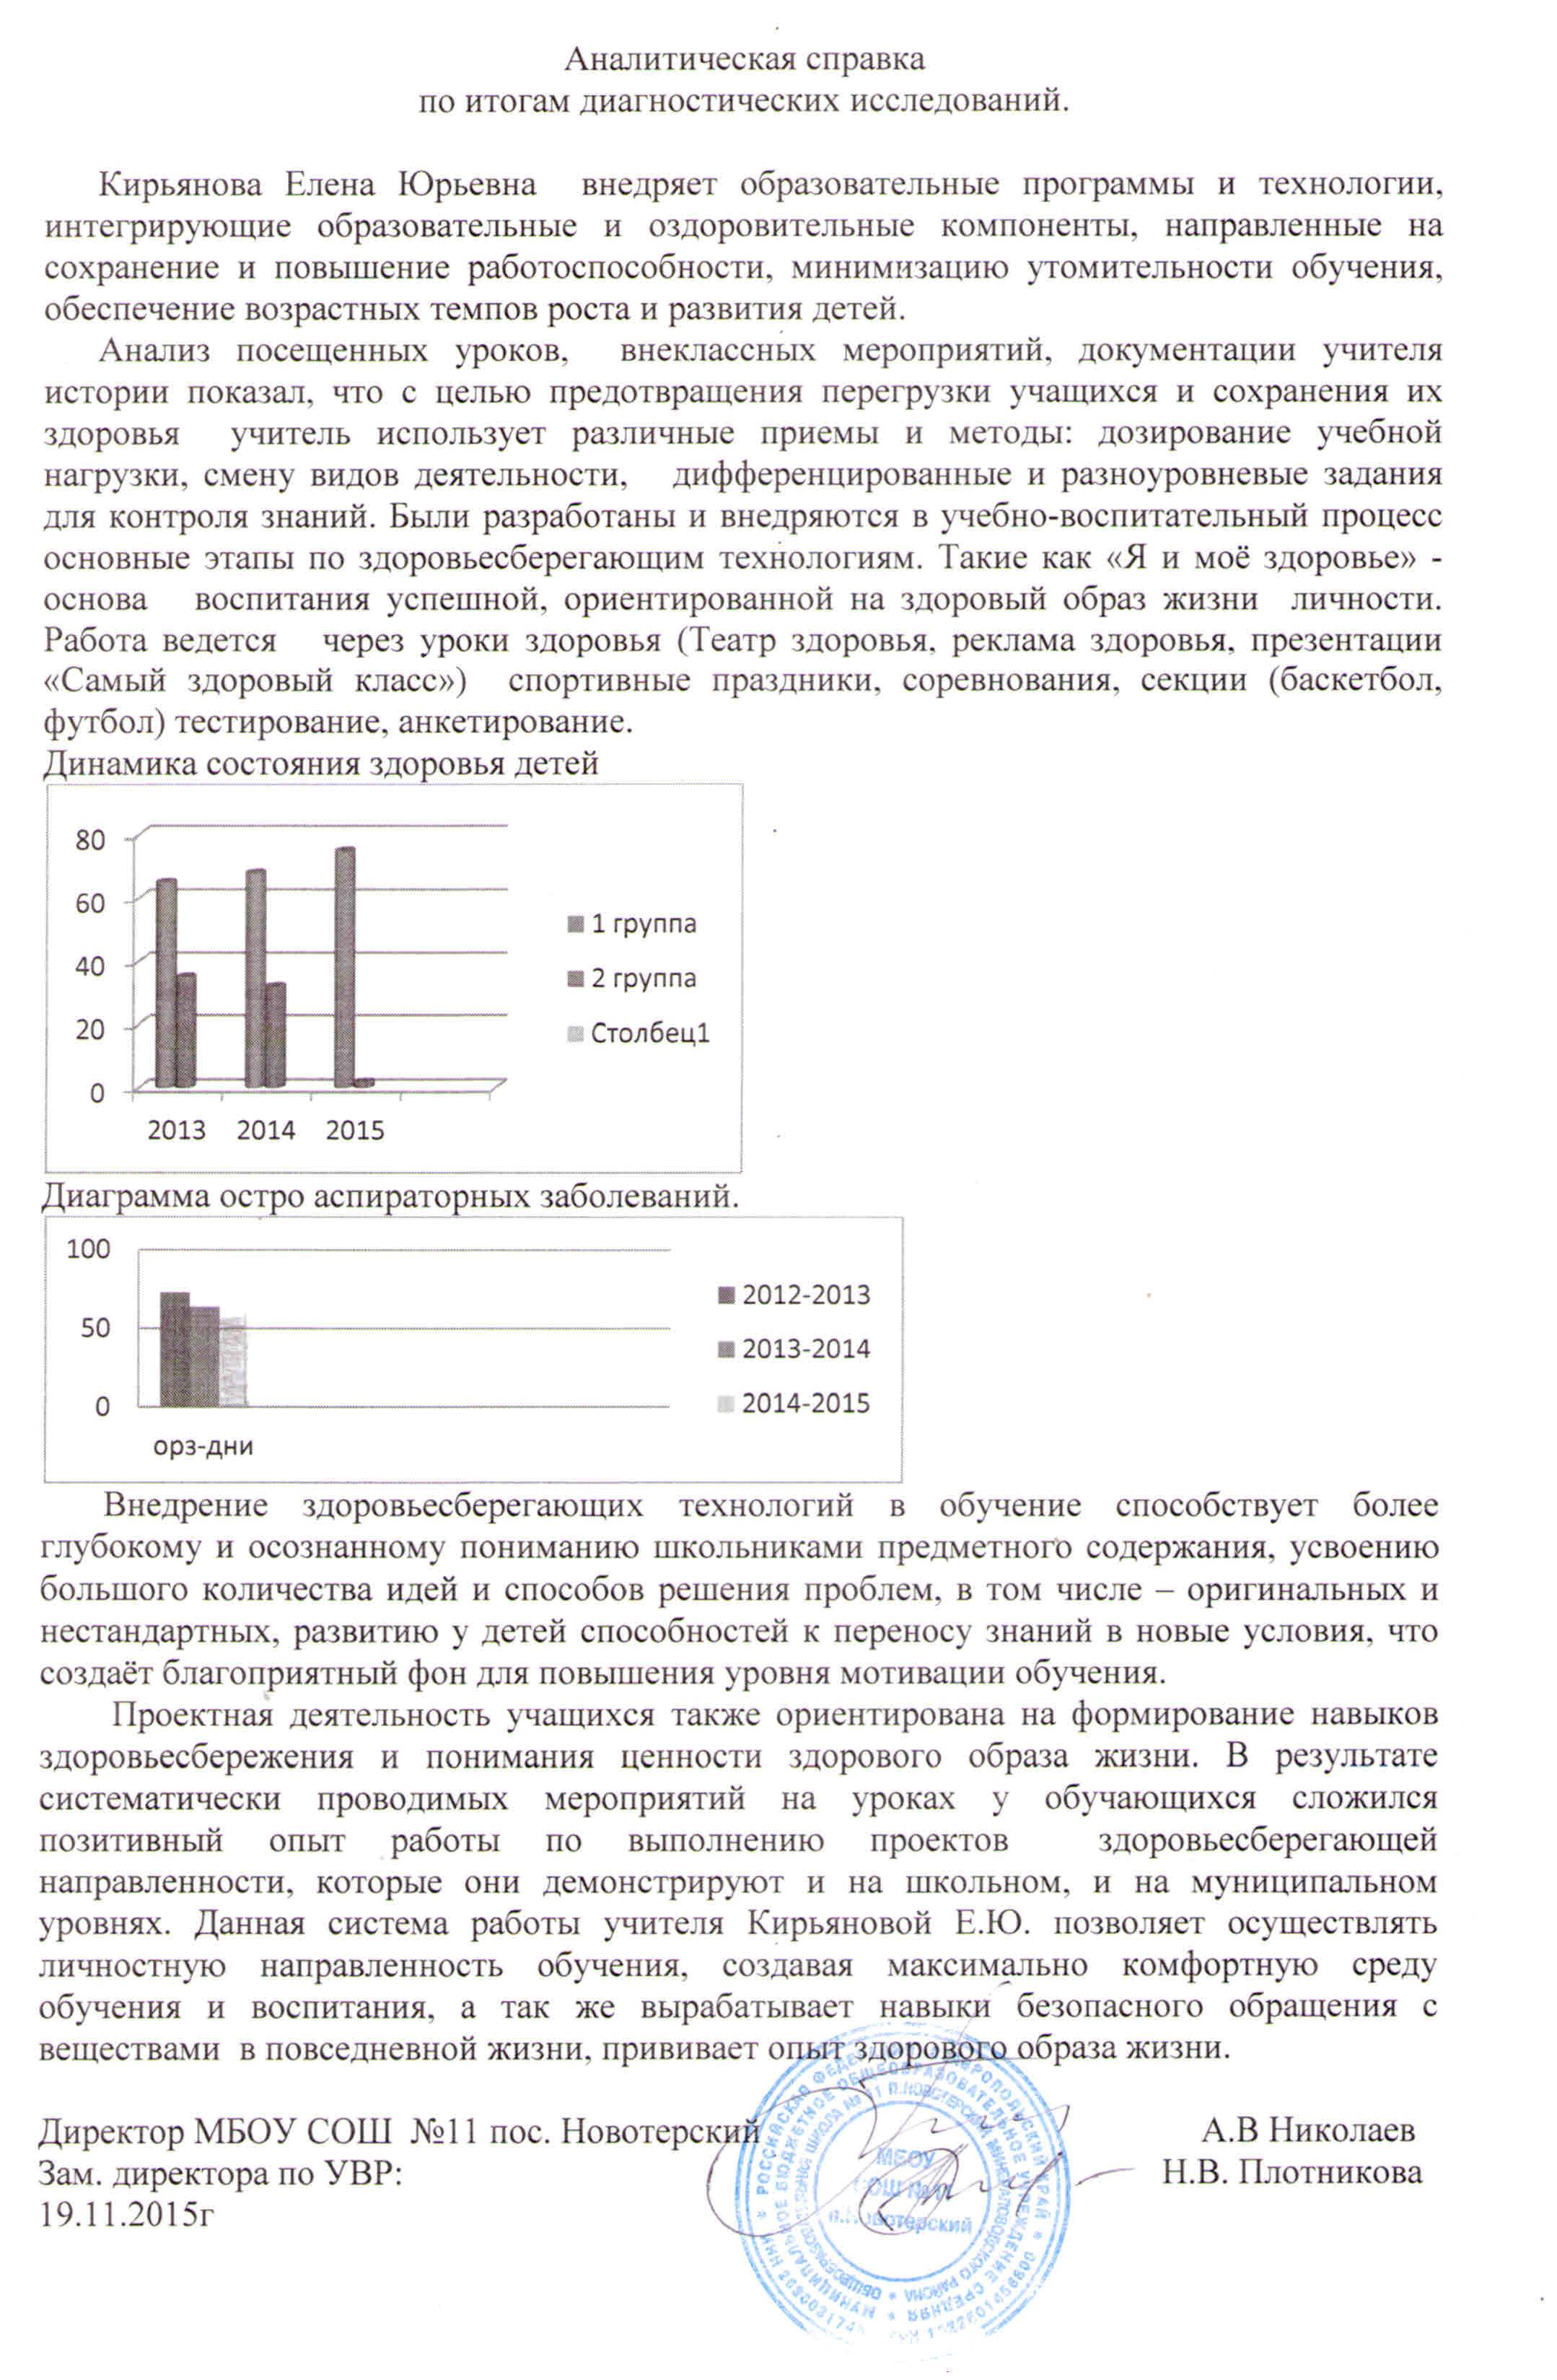 C:\Users\Сергей\Desktop\аналитсправка\Document_24.jpg